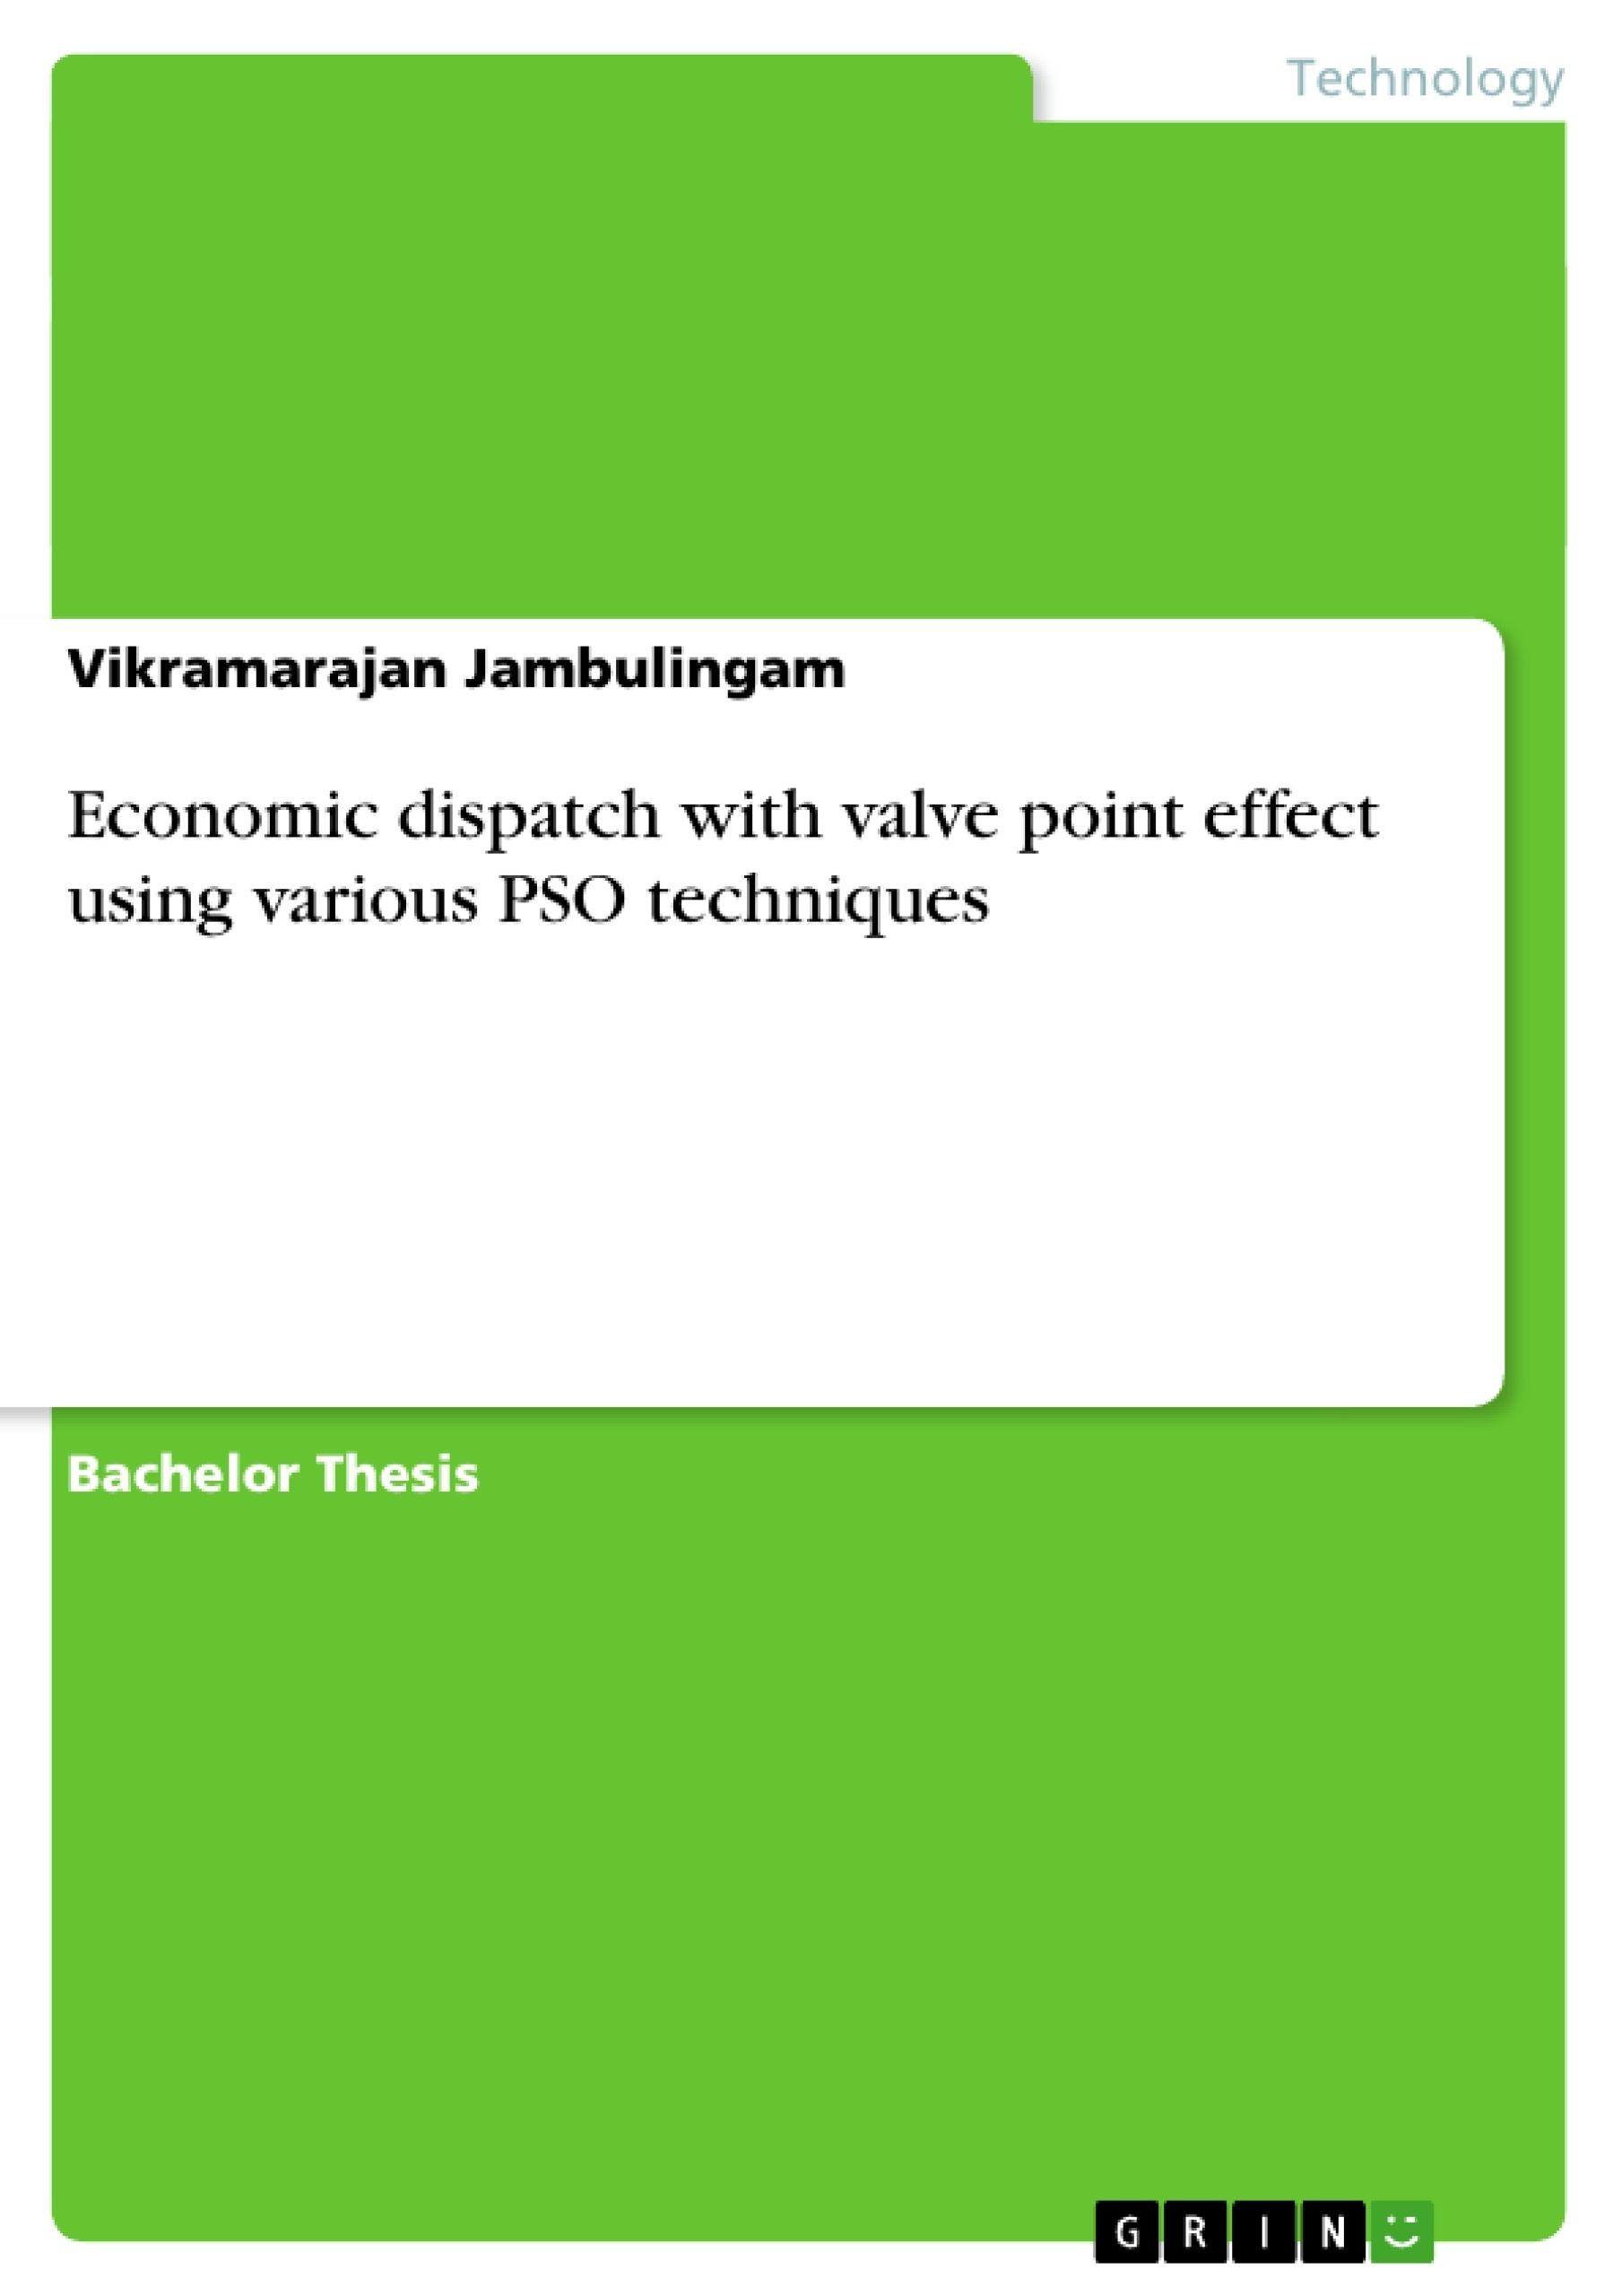 Title: Economic dispatch with valve point effect using various PSO techniques